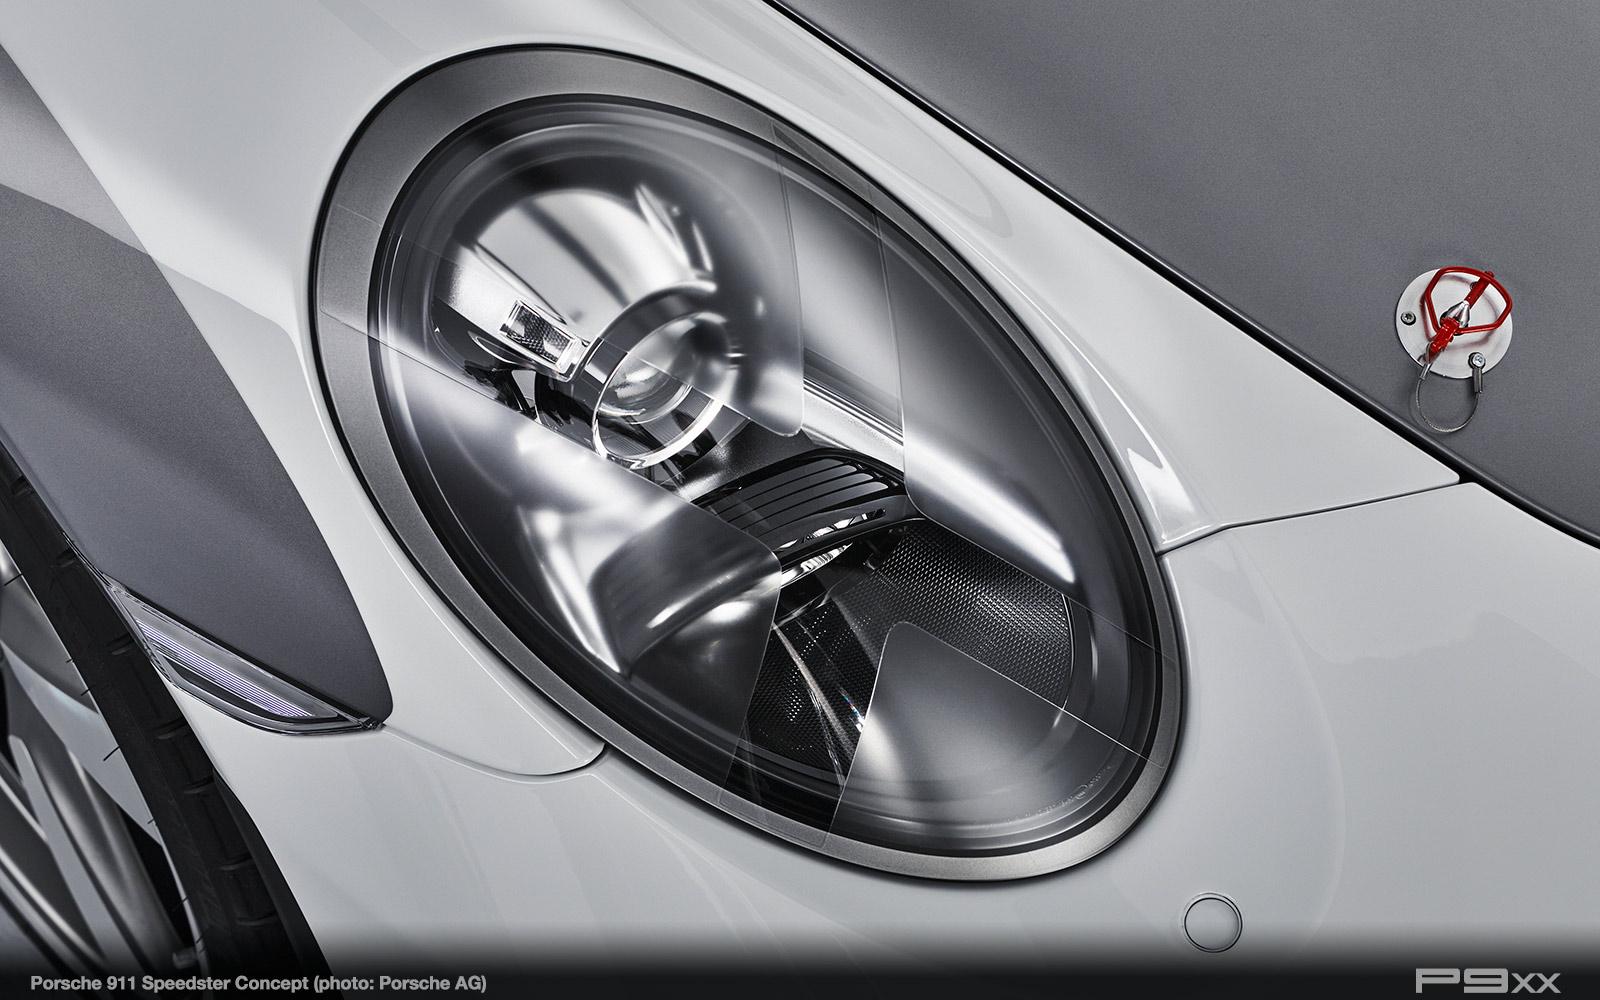 Porsche-911-Speedster-Concept-2018-308